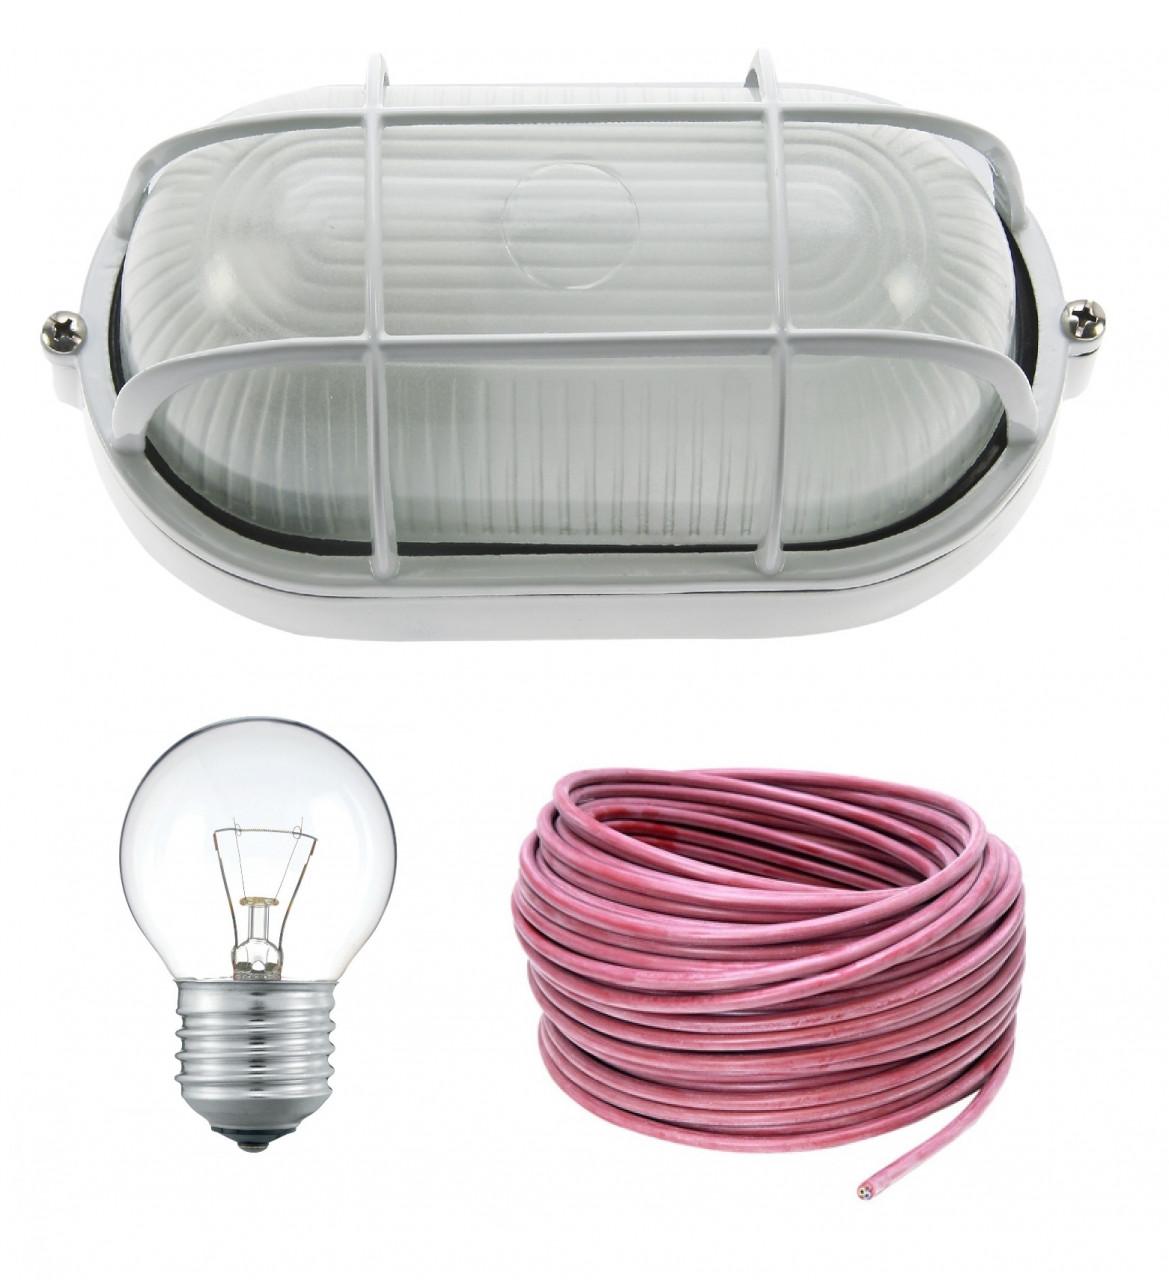 Aansluitset met bulley, lamp & 3,5m kabel